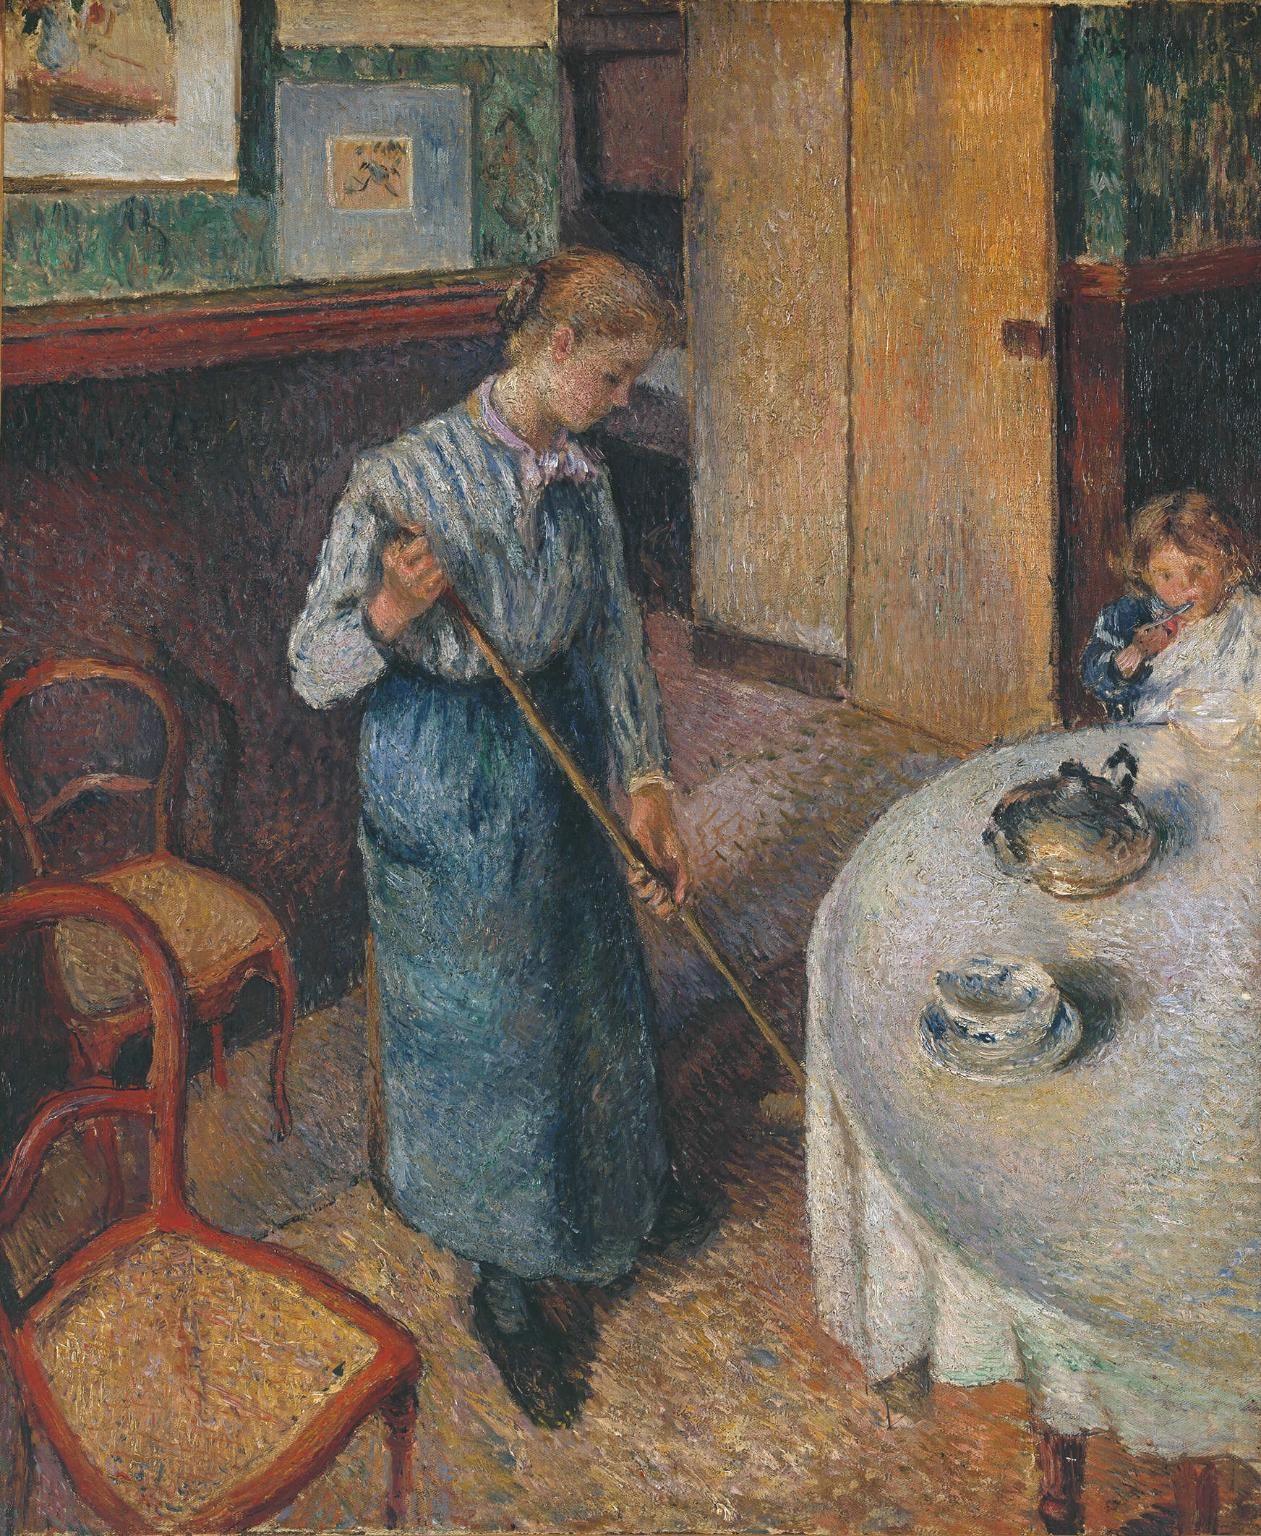 Camille Pissarro (1830–1903), The Little Country Maid (La Petite Bonne de campagne), 1882 | Collection Tate